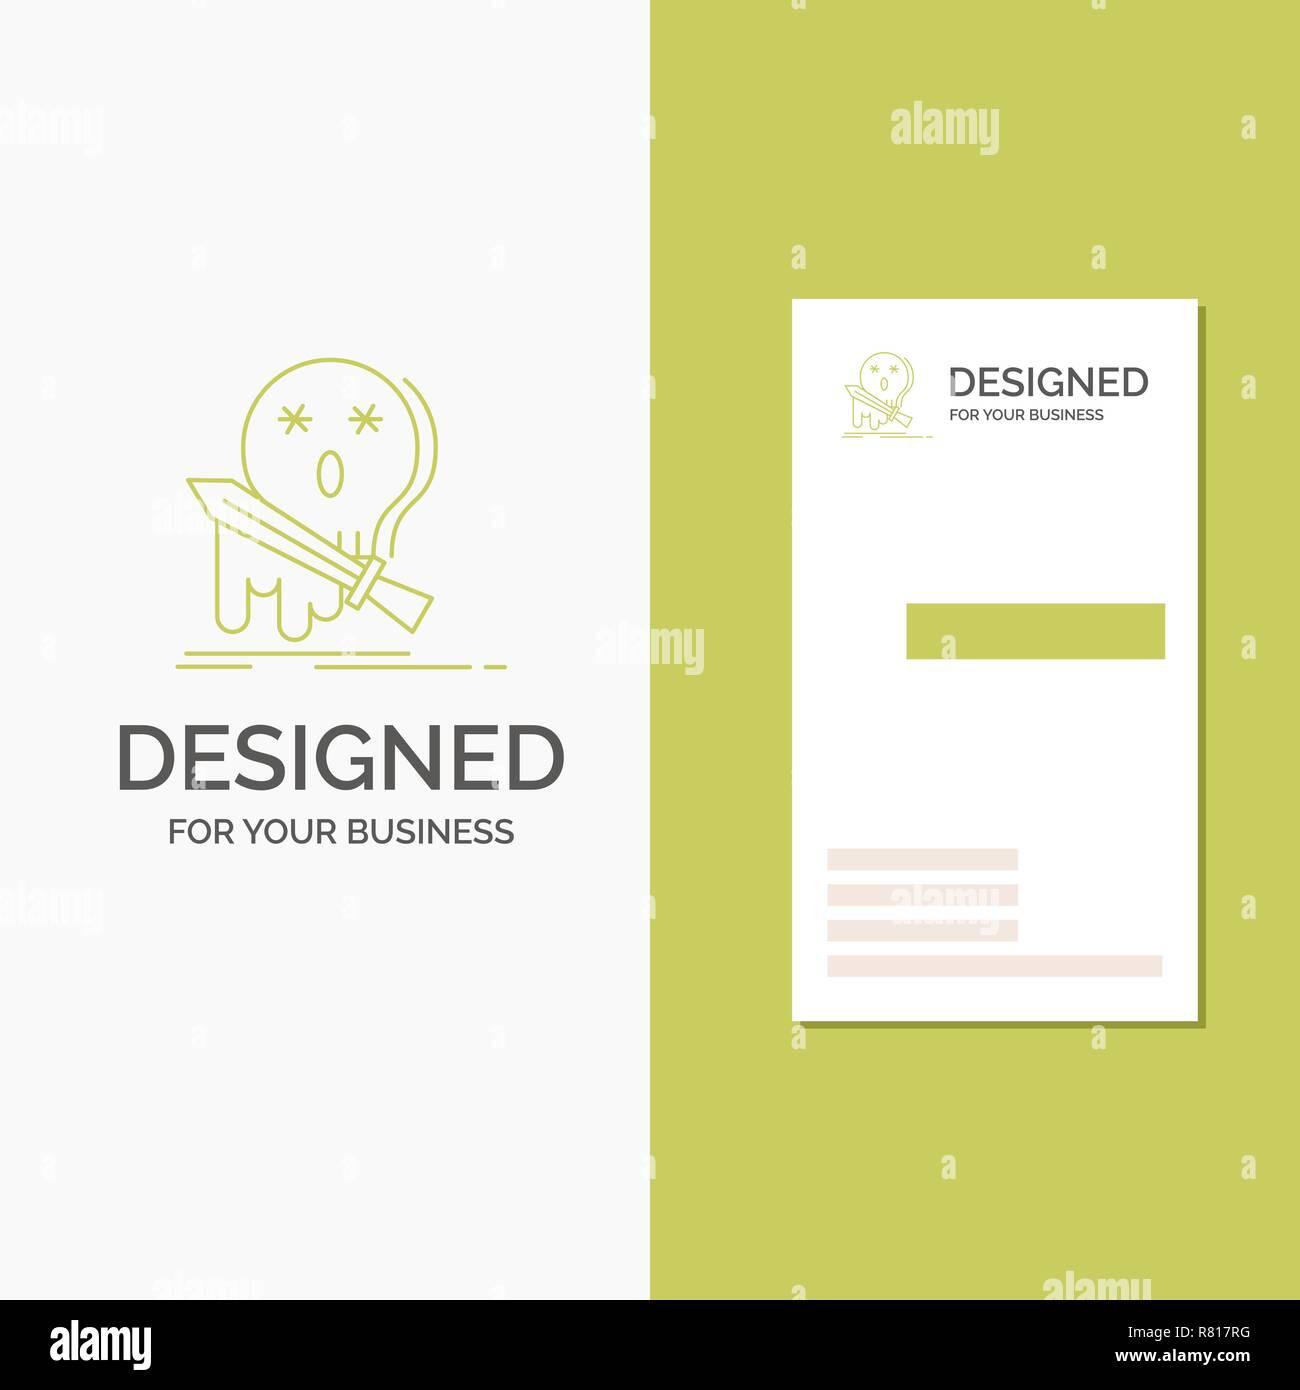 Logo Dentreprise En Cas De Deces Frag Jeu Tuer Epee Lentreprise Verte Verticale Modele Carte Visite Arriere Plan Creatif Vector